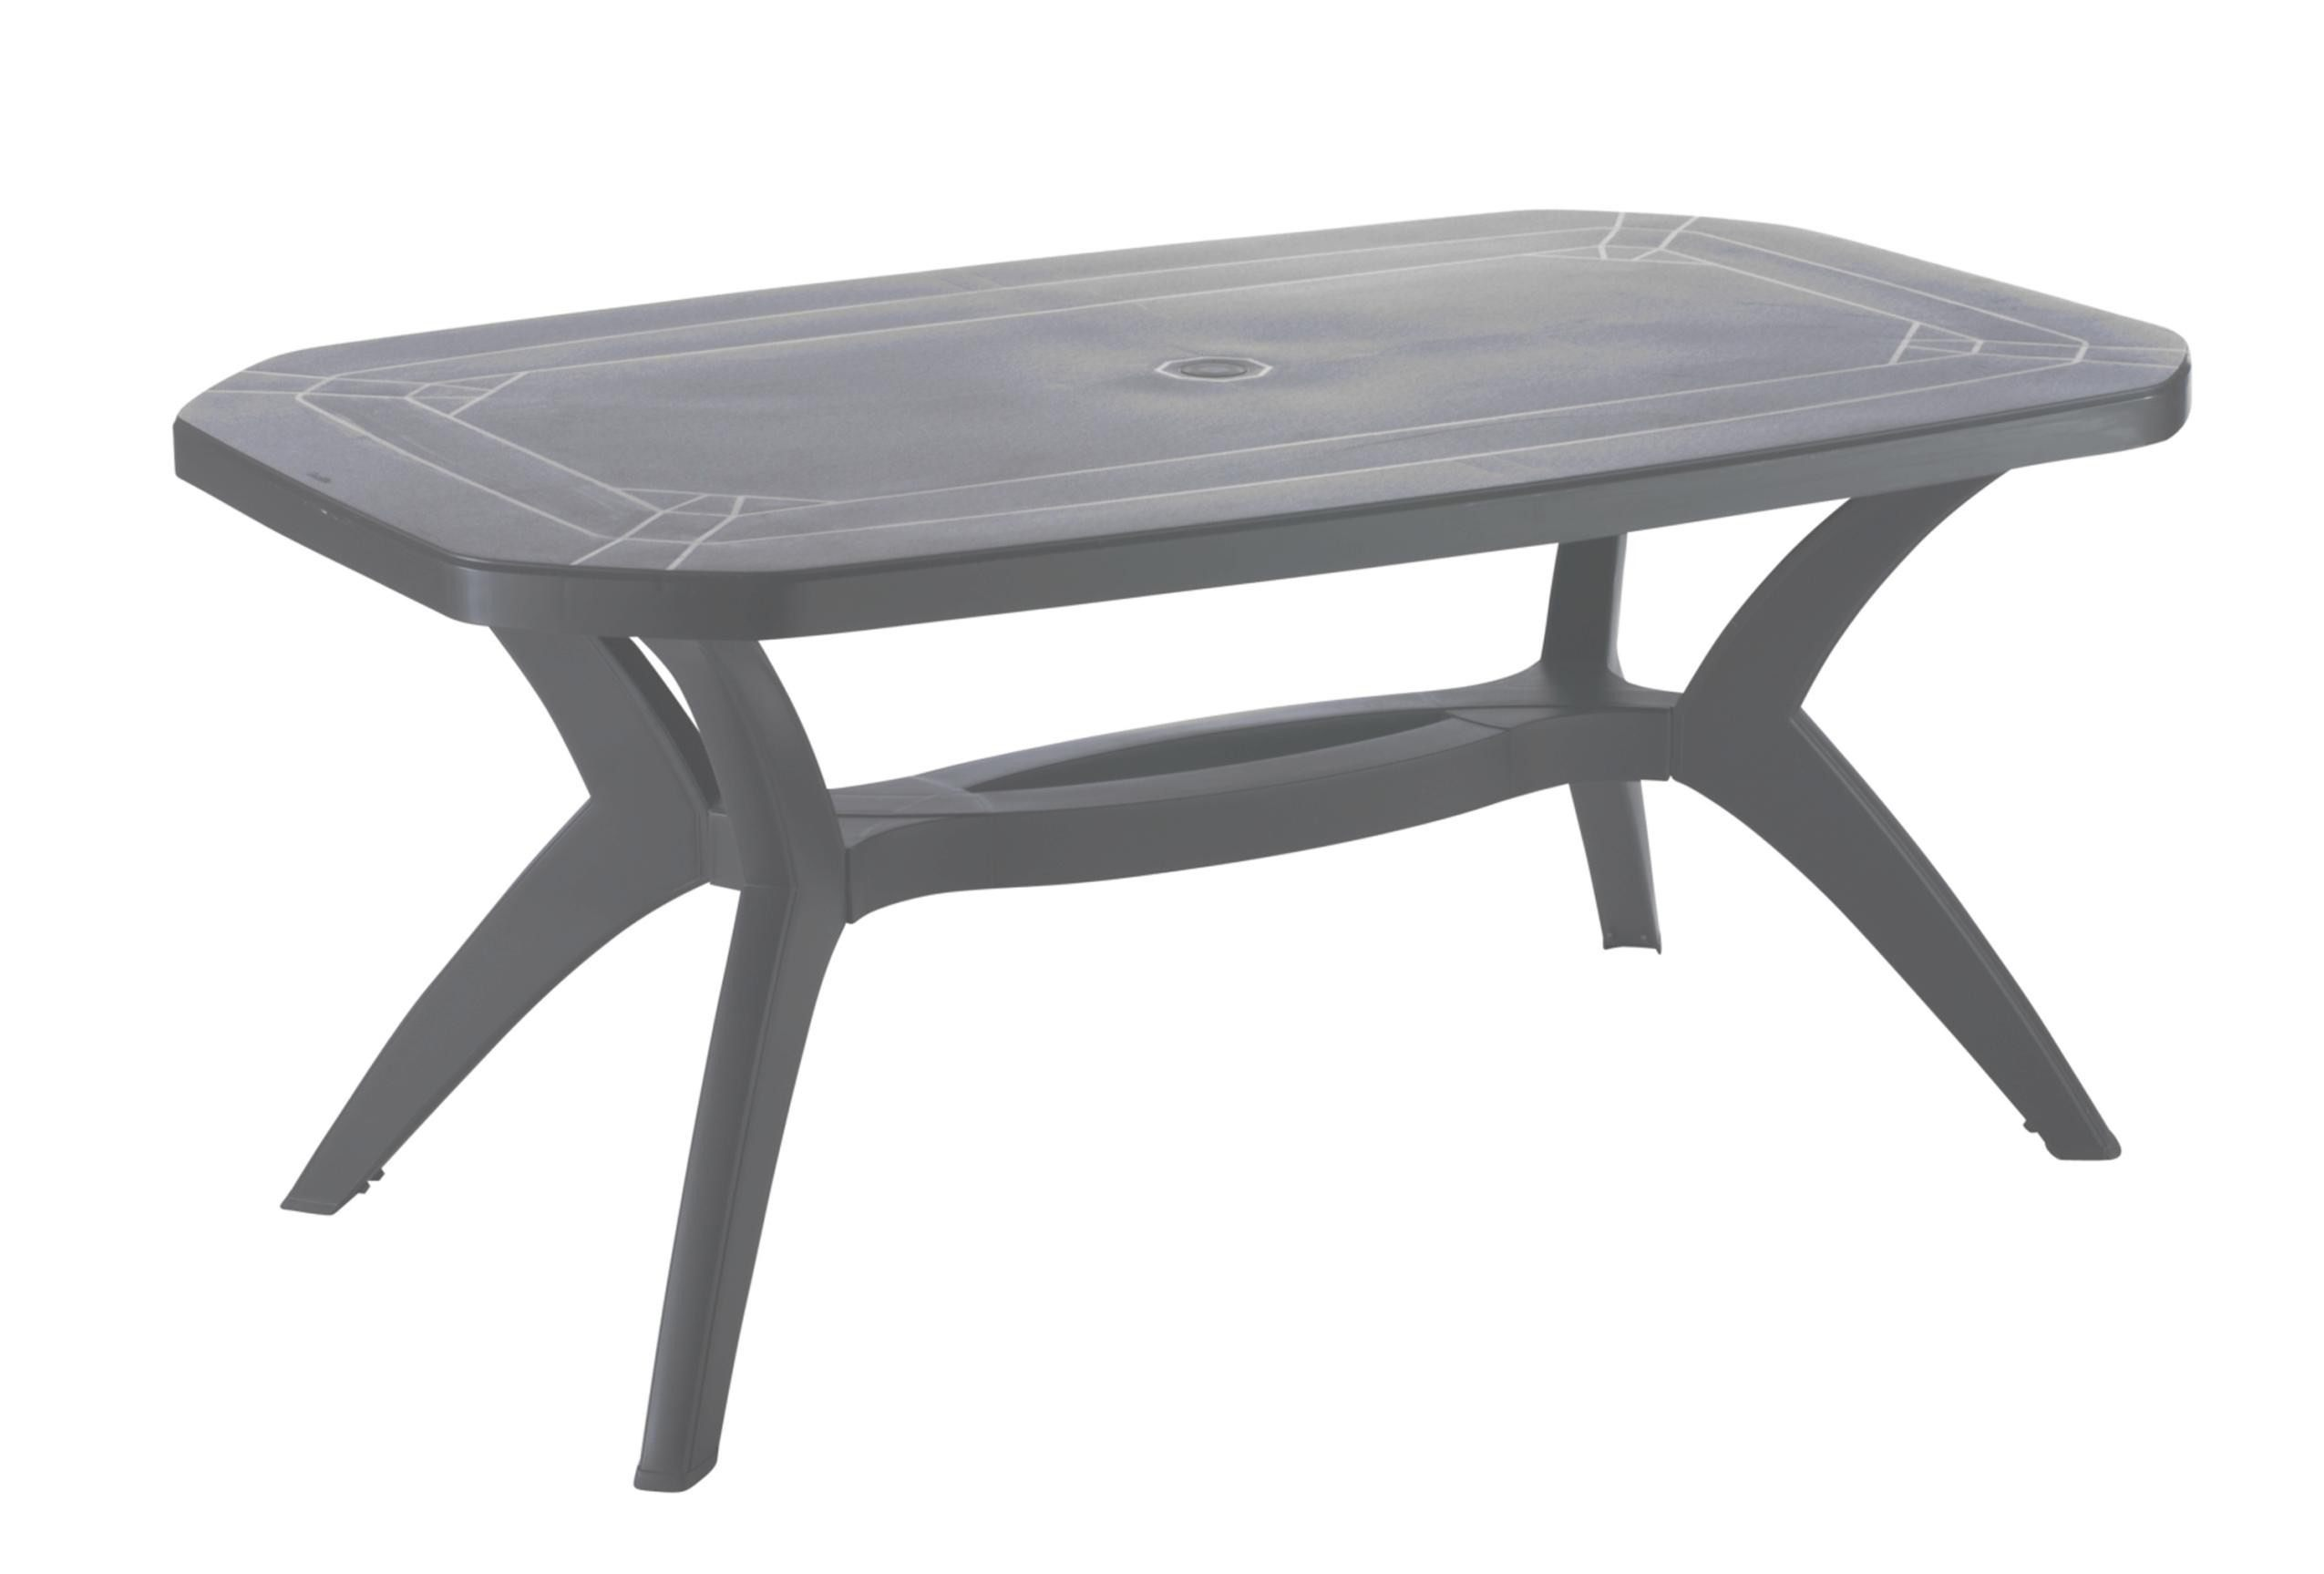 table de jardin bricorama frais engageant bricorama table de jardin beau bricorama table pliante de table de jardin bricorama